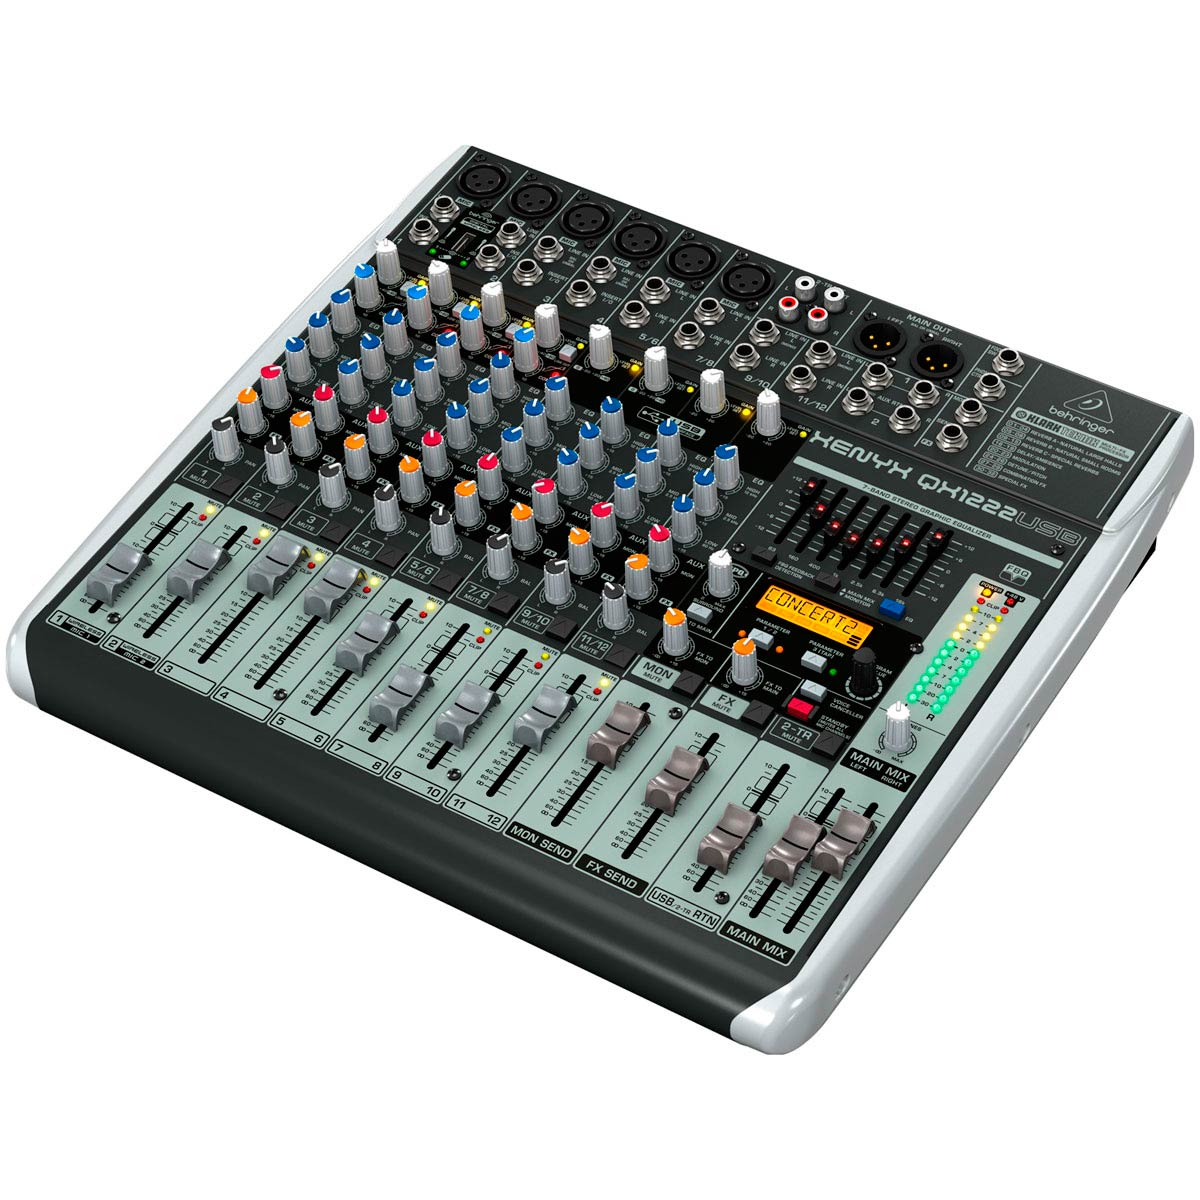 Mesa de Som 12 Canais (6 XLR + 2 P10 Balanceados + 4 P10 Desbalanceados) c/ USB / Efeito / Phantom / 2 Auxiliares Xenyx QX 1222 USB - Behringer